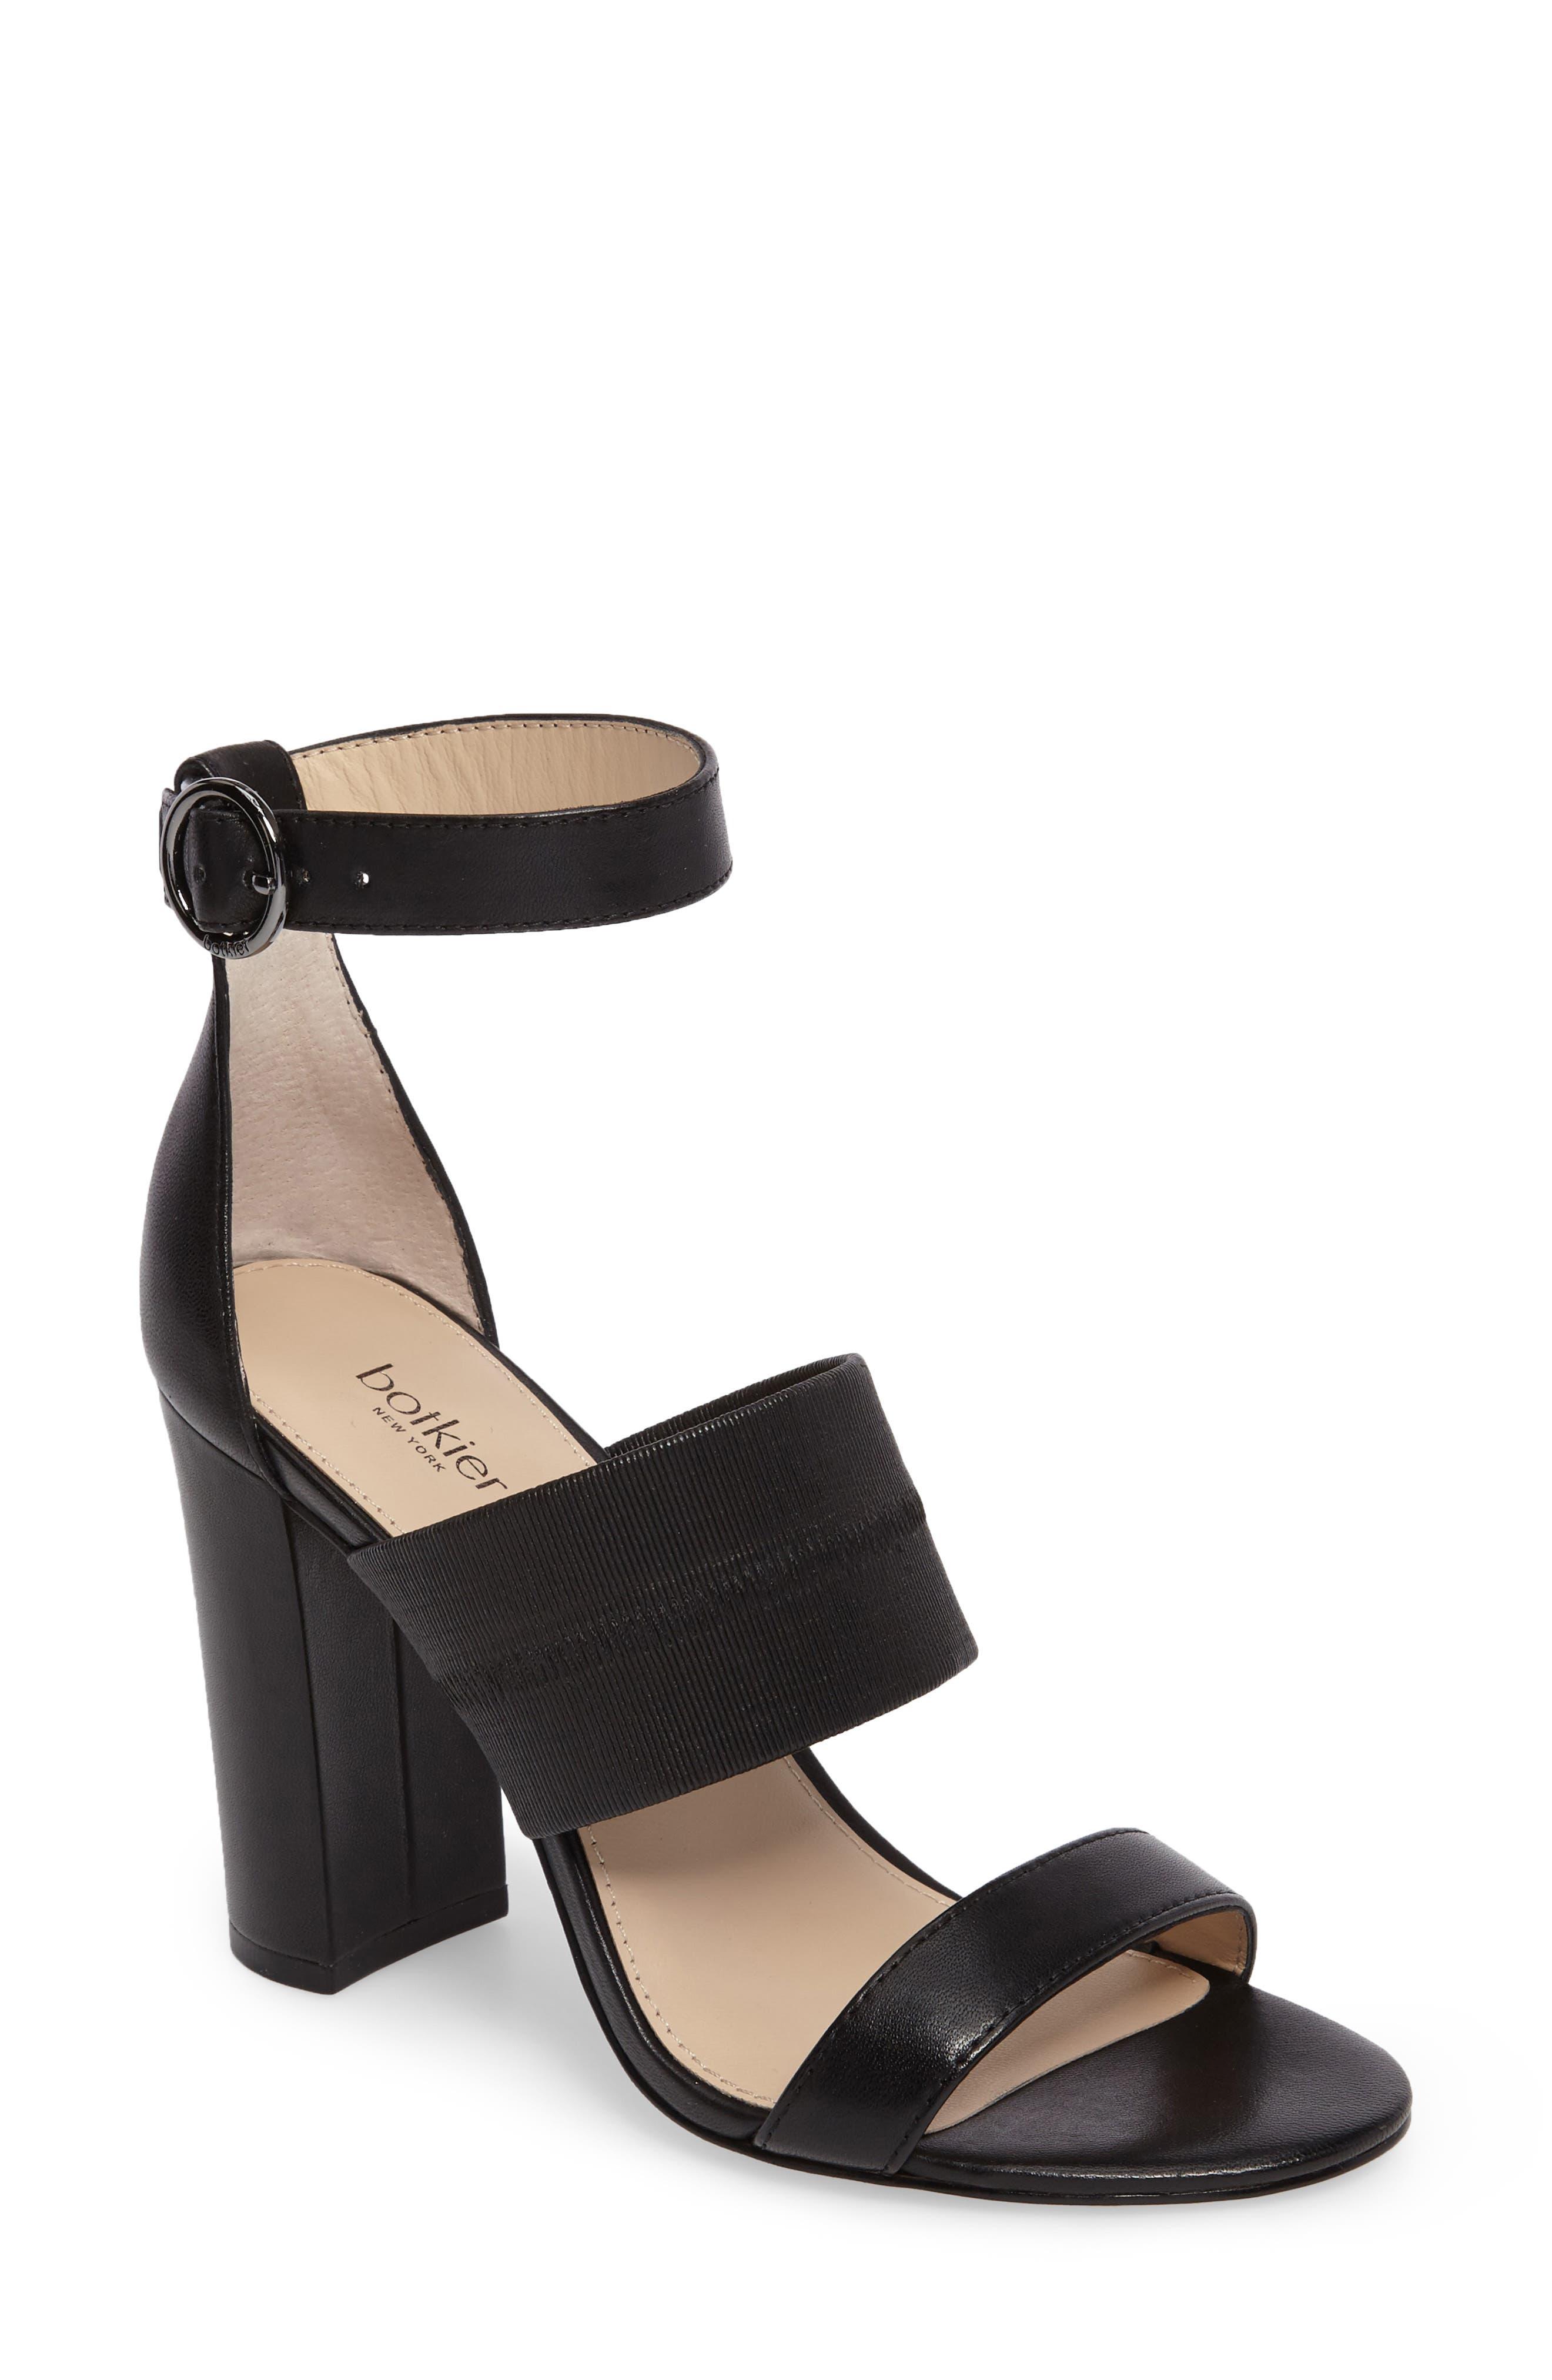 Gisella Ankle Strap Sandal,                             Main thumbnail 1, color,                             001